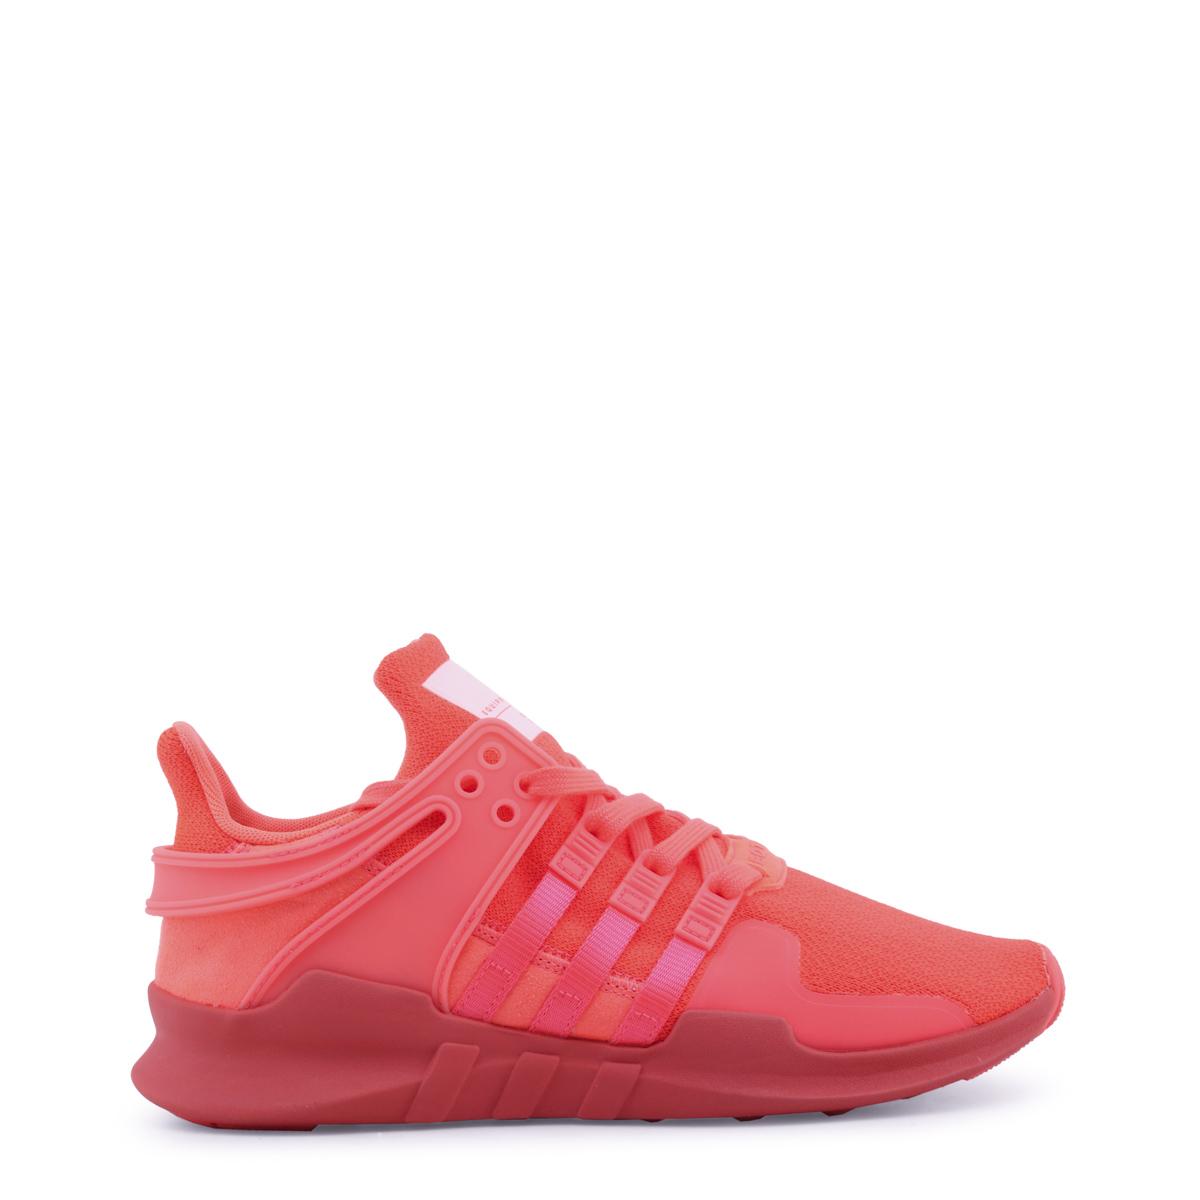 Adidas EQT_SUPPORT_ADV Donna Rosso 97943